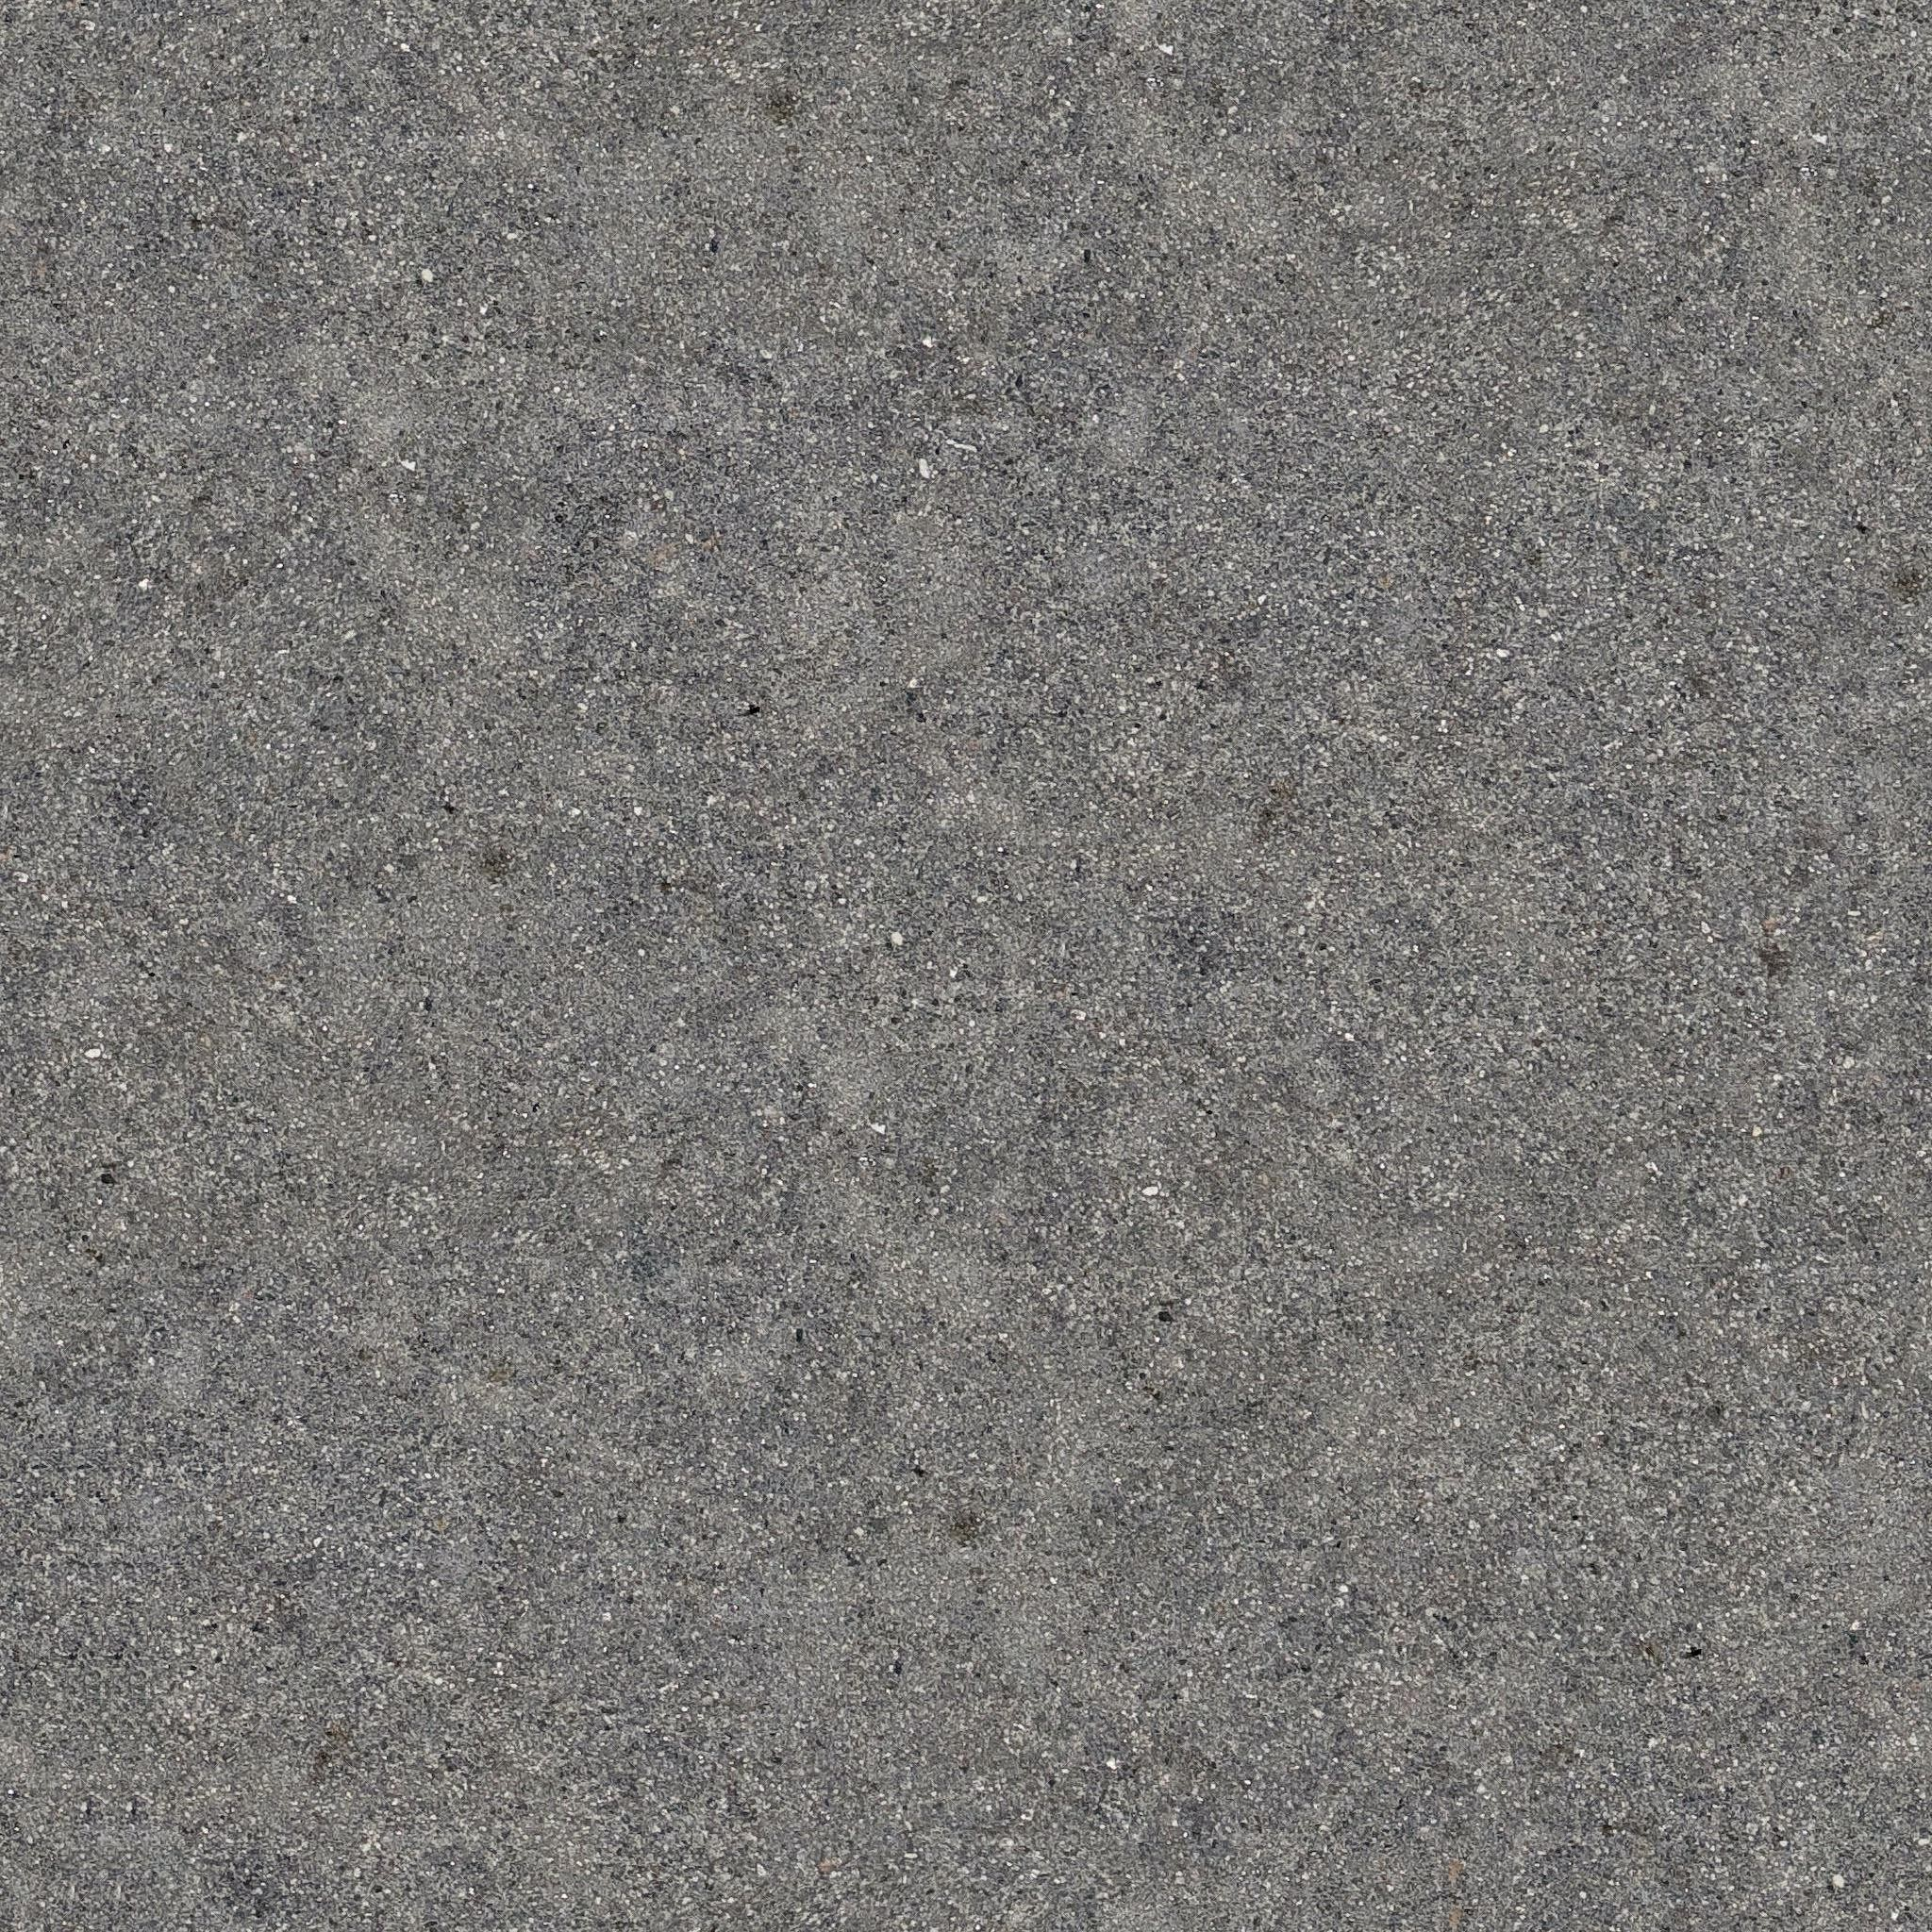 Concrete Seamless Texture Set Volume 2 By JeremiahAvenger